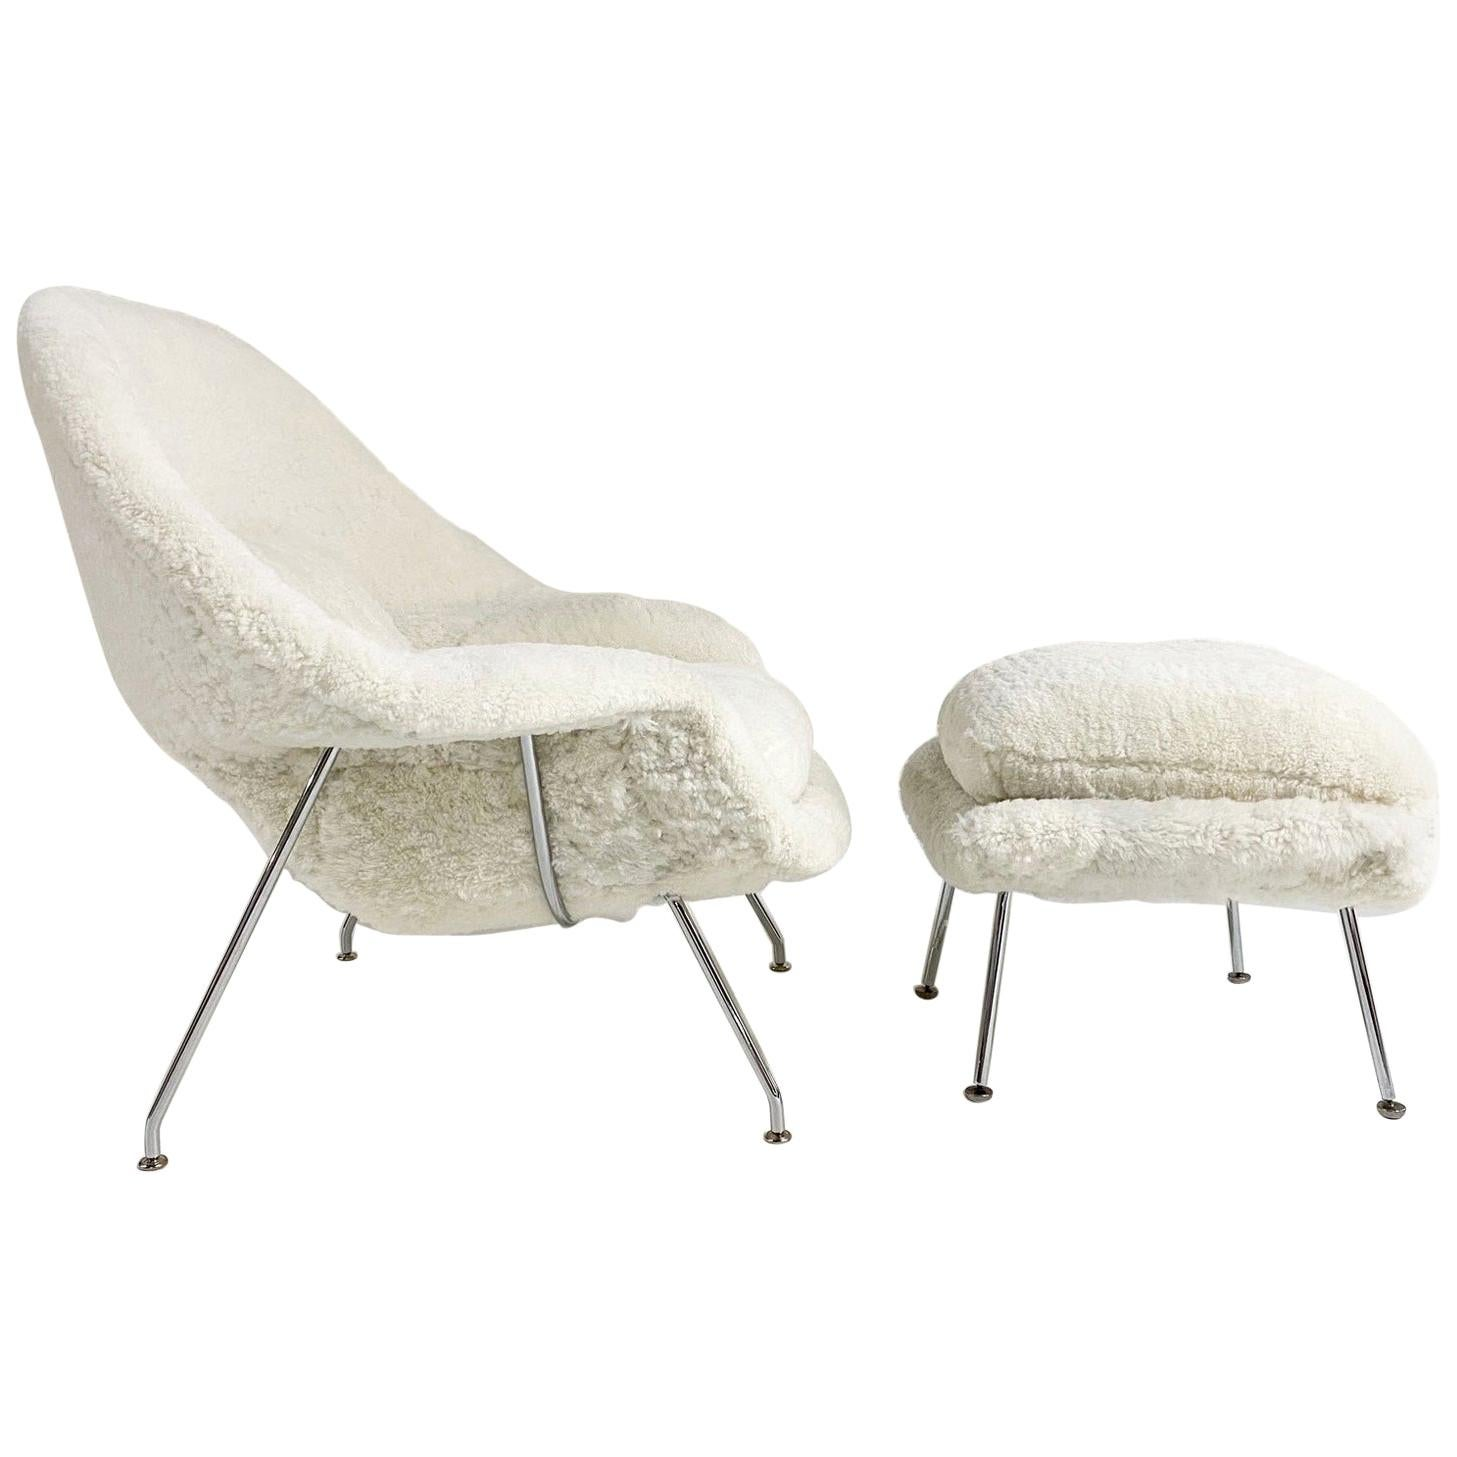 Bespoke Eero Saarinen Womb Chair and Ottoman in Australian Sheepskin